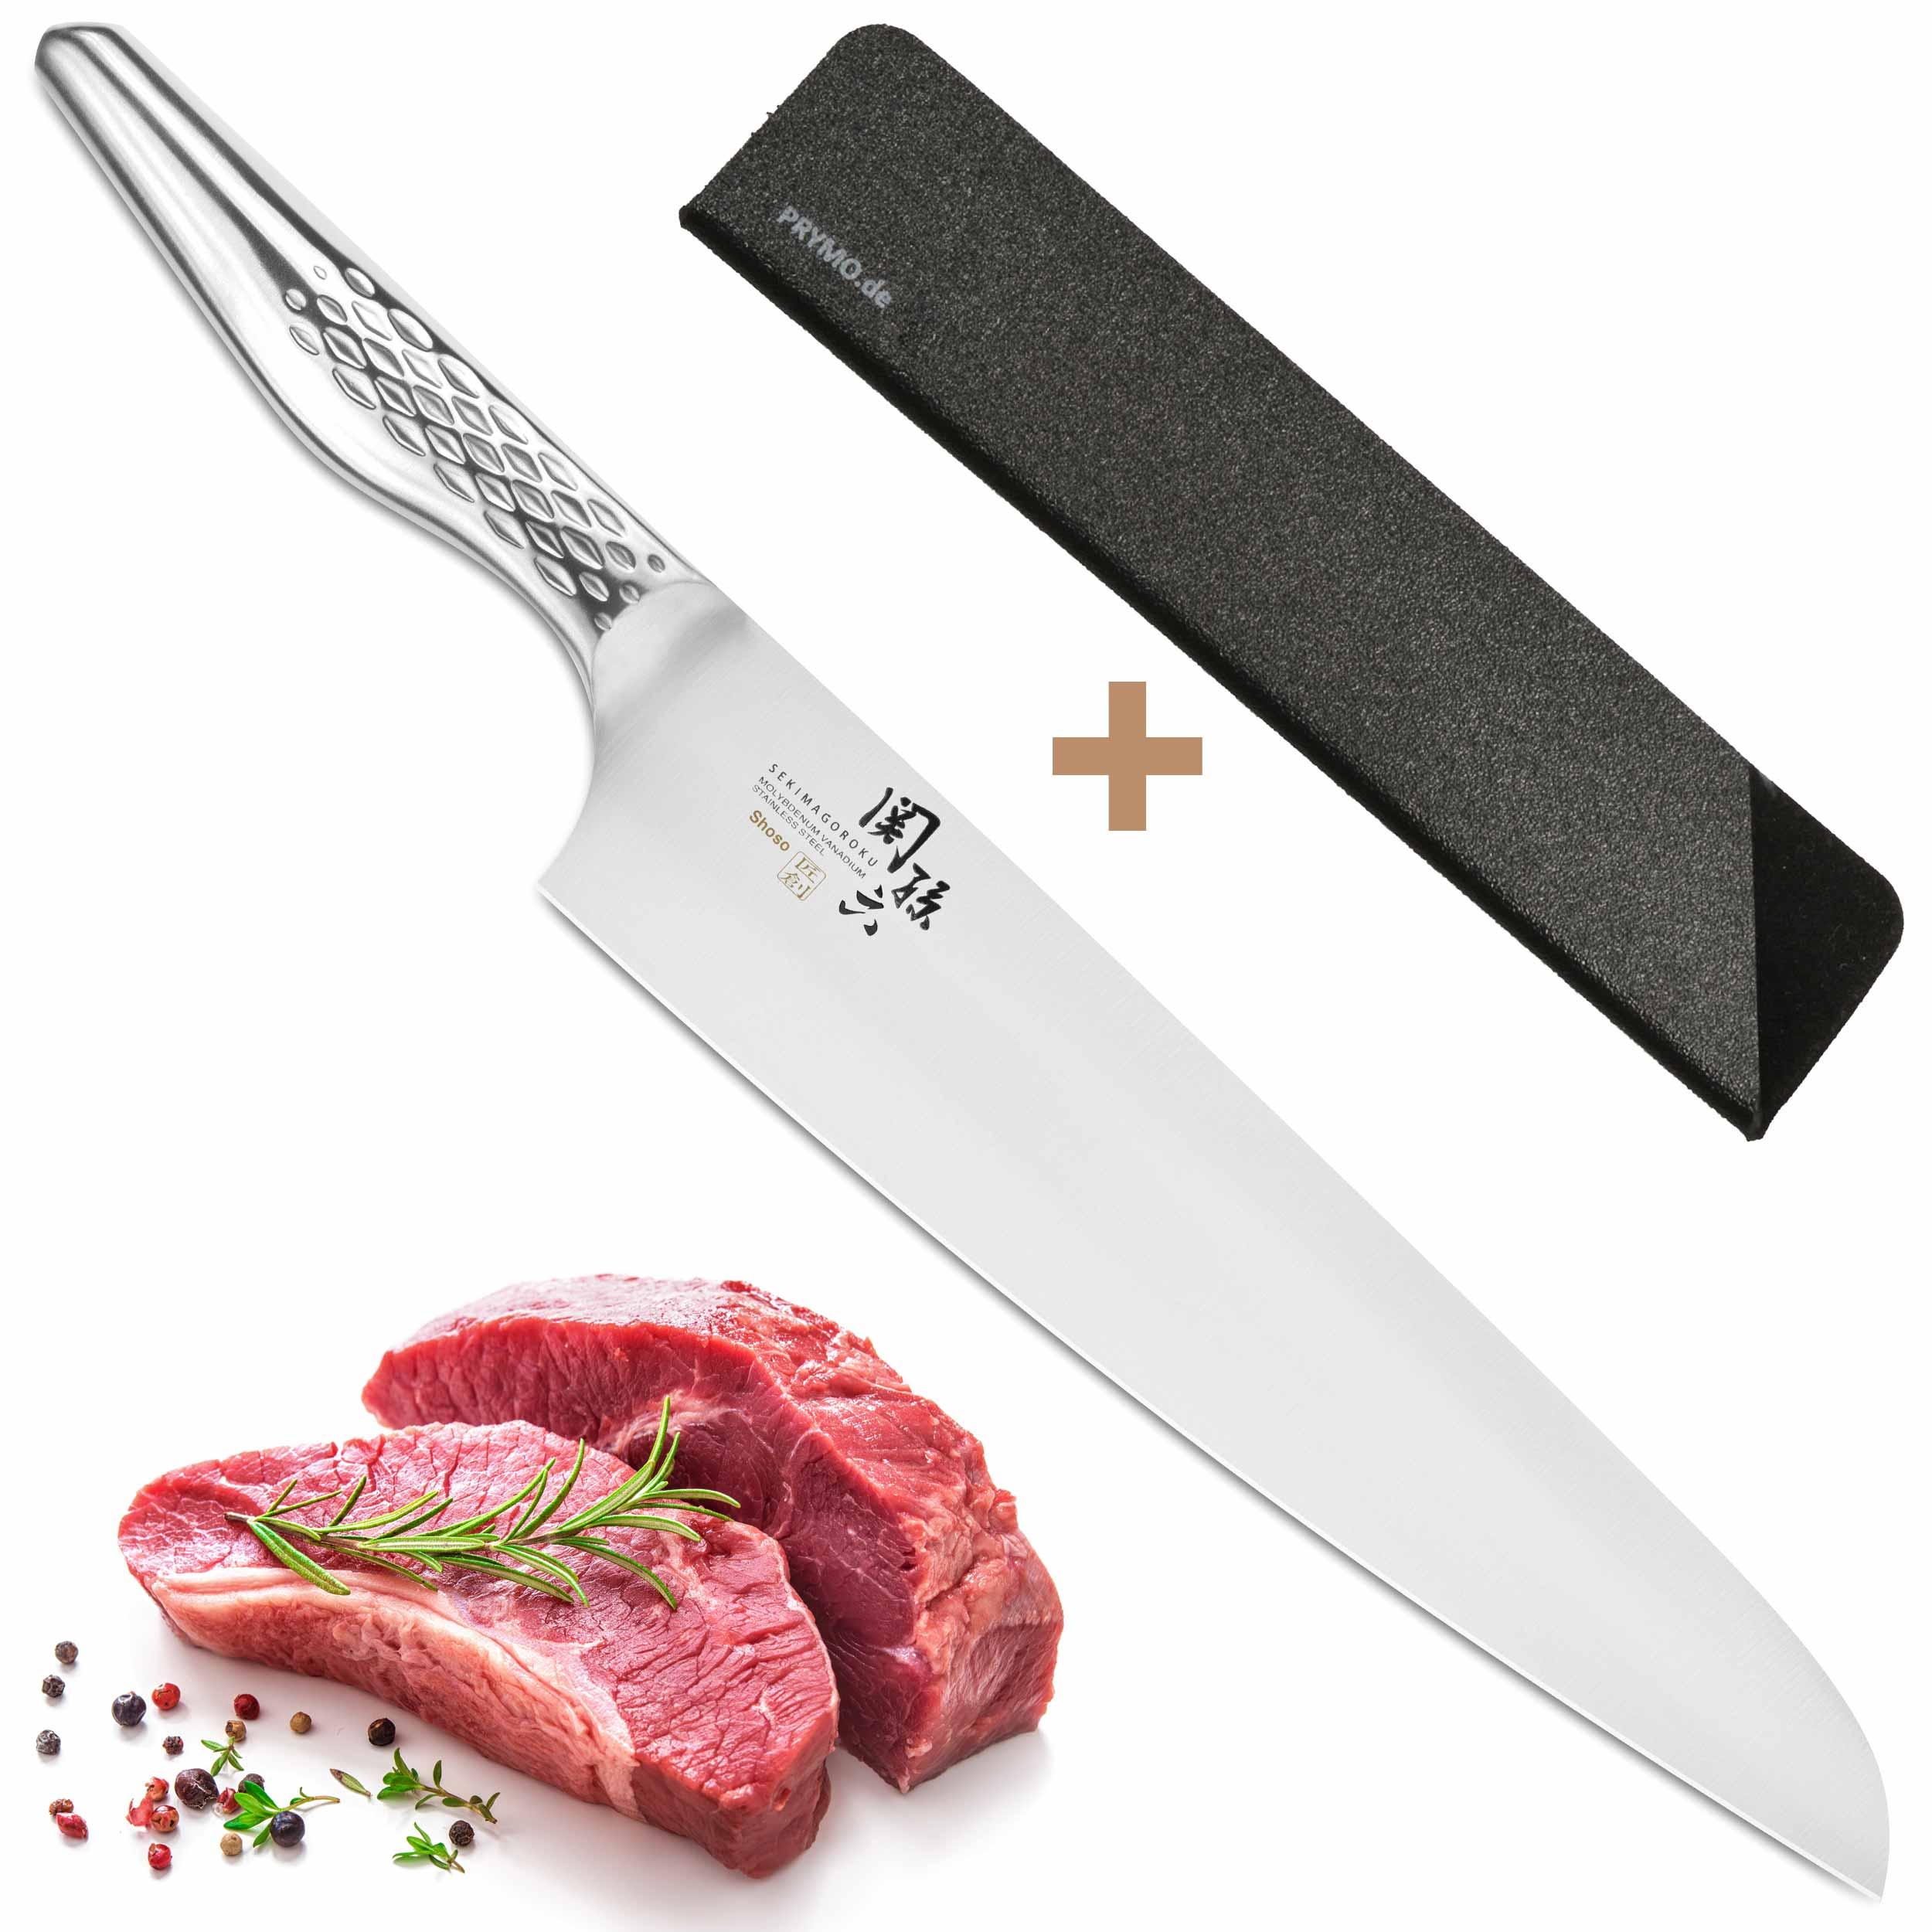 KAI Seki Magoroku Shoso AB-5160 Kochmesser 24 cm